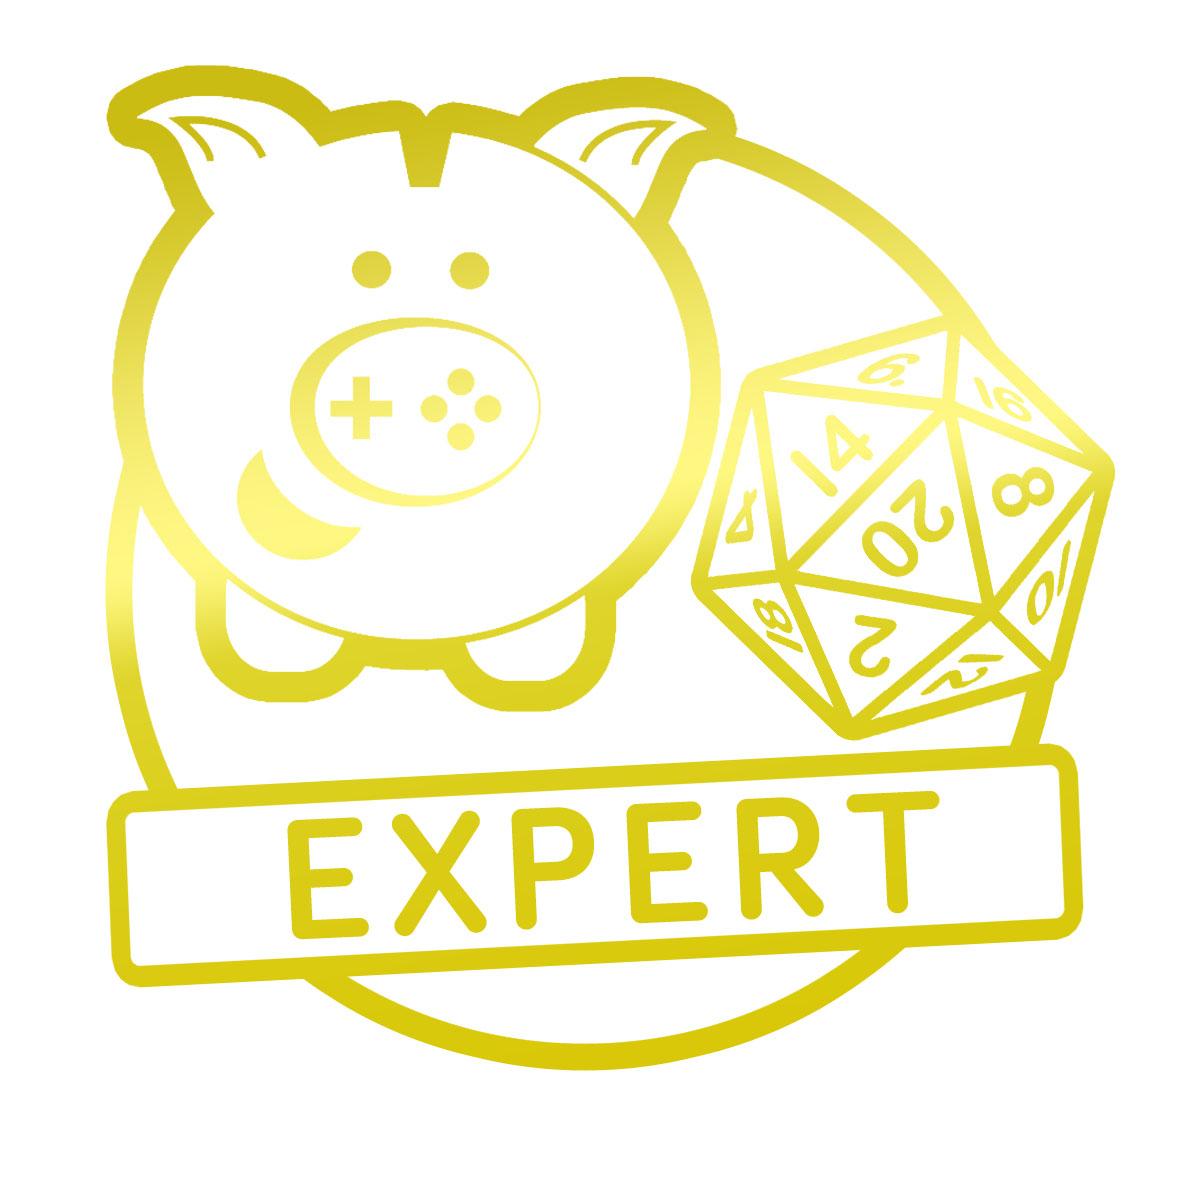 Budgy Expert Goud